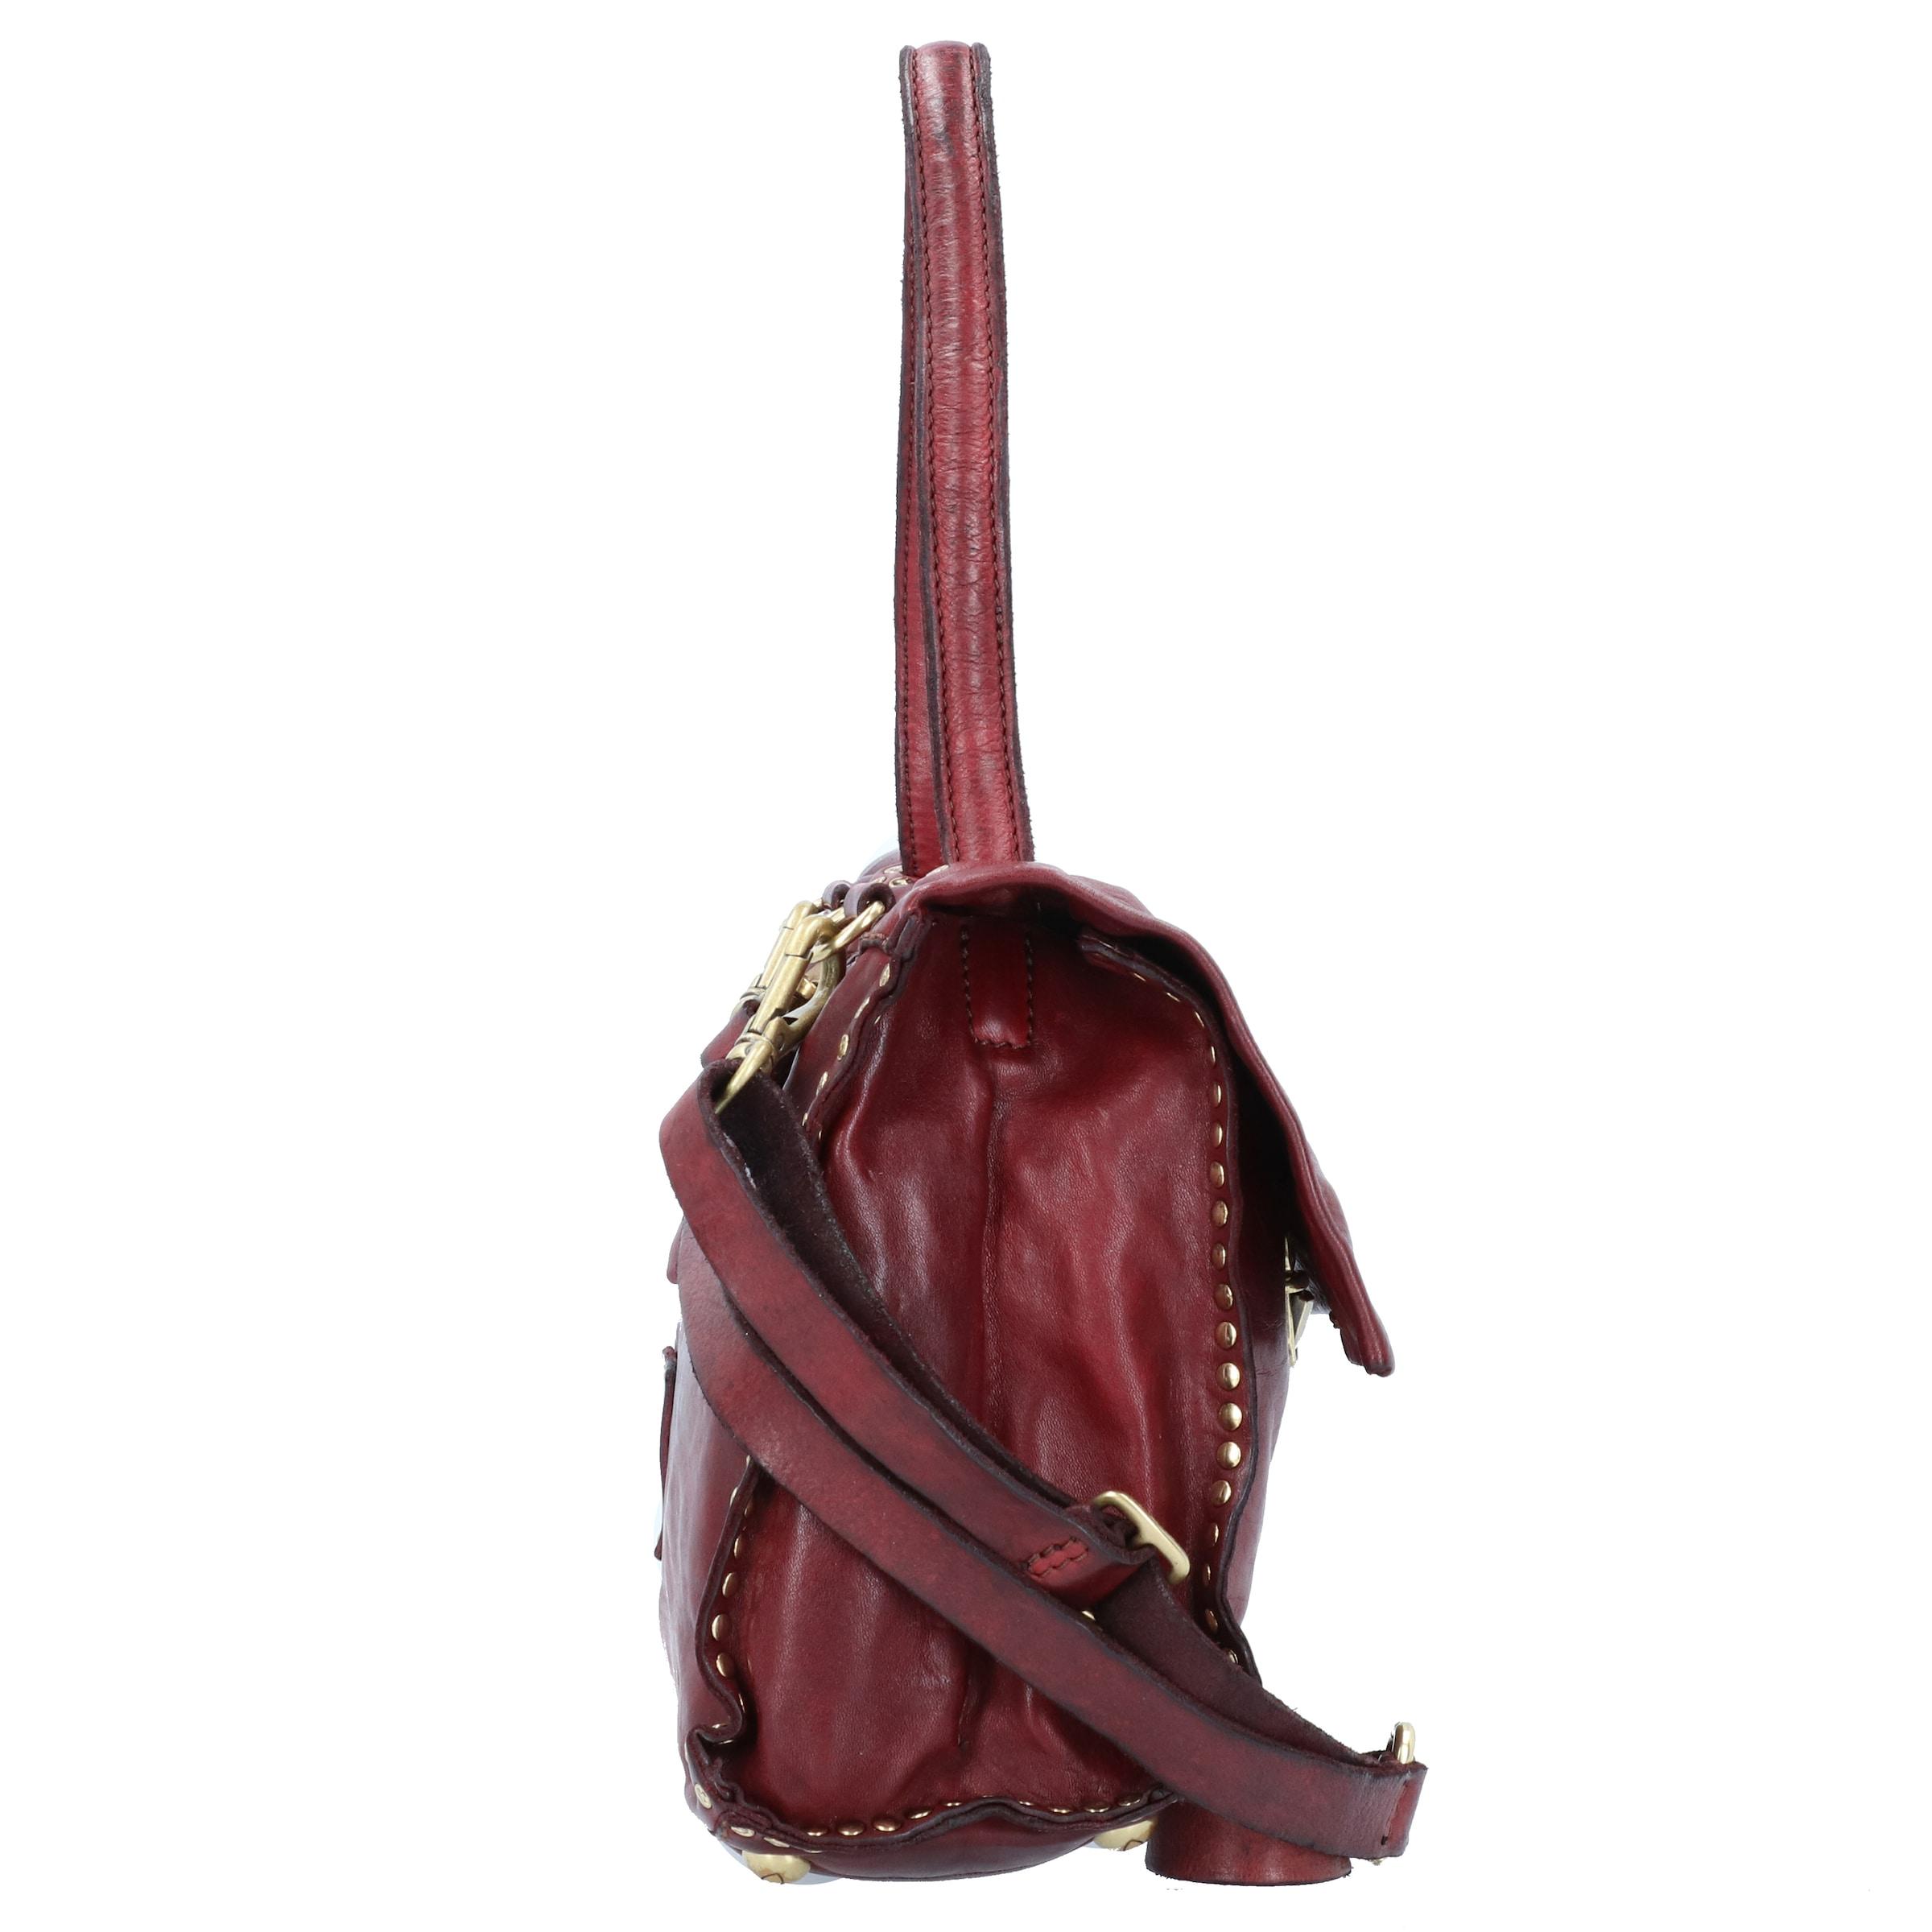 Rubinrot In Rubinrot Campomaggi Handtasche Handtasche Campomaggi Campomaggi In 6yvb7gYf